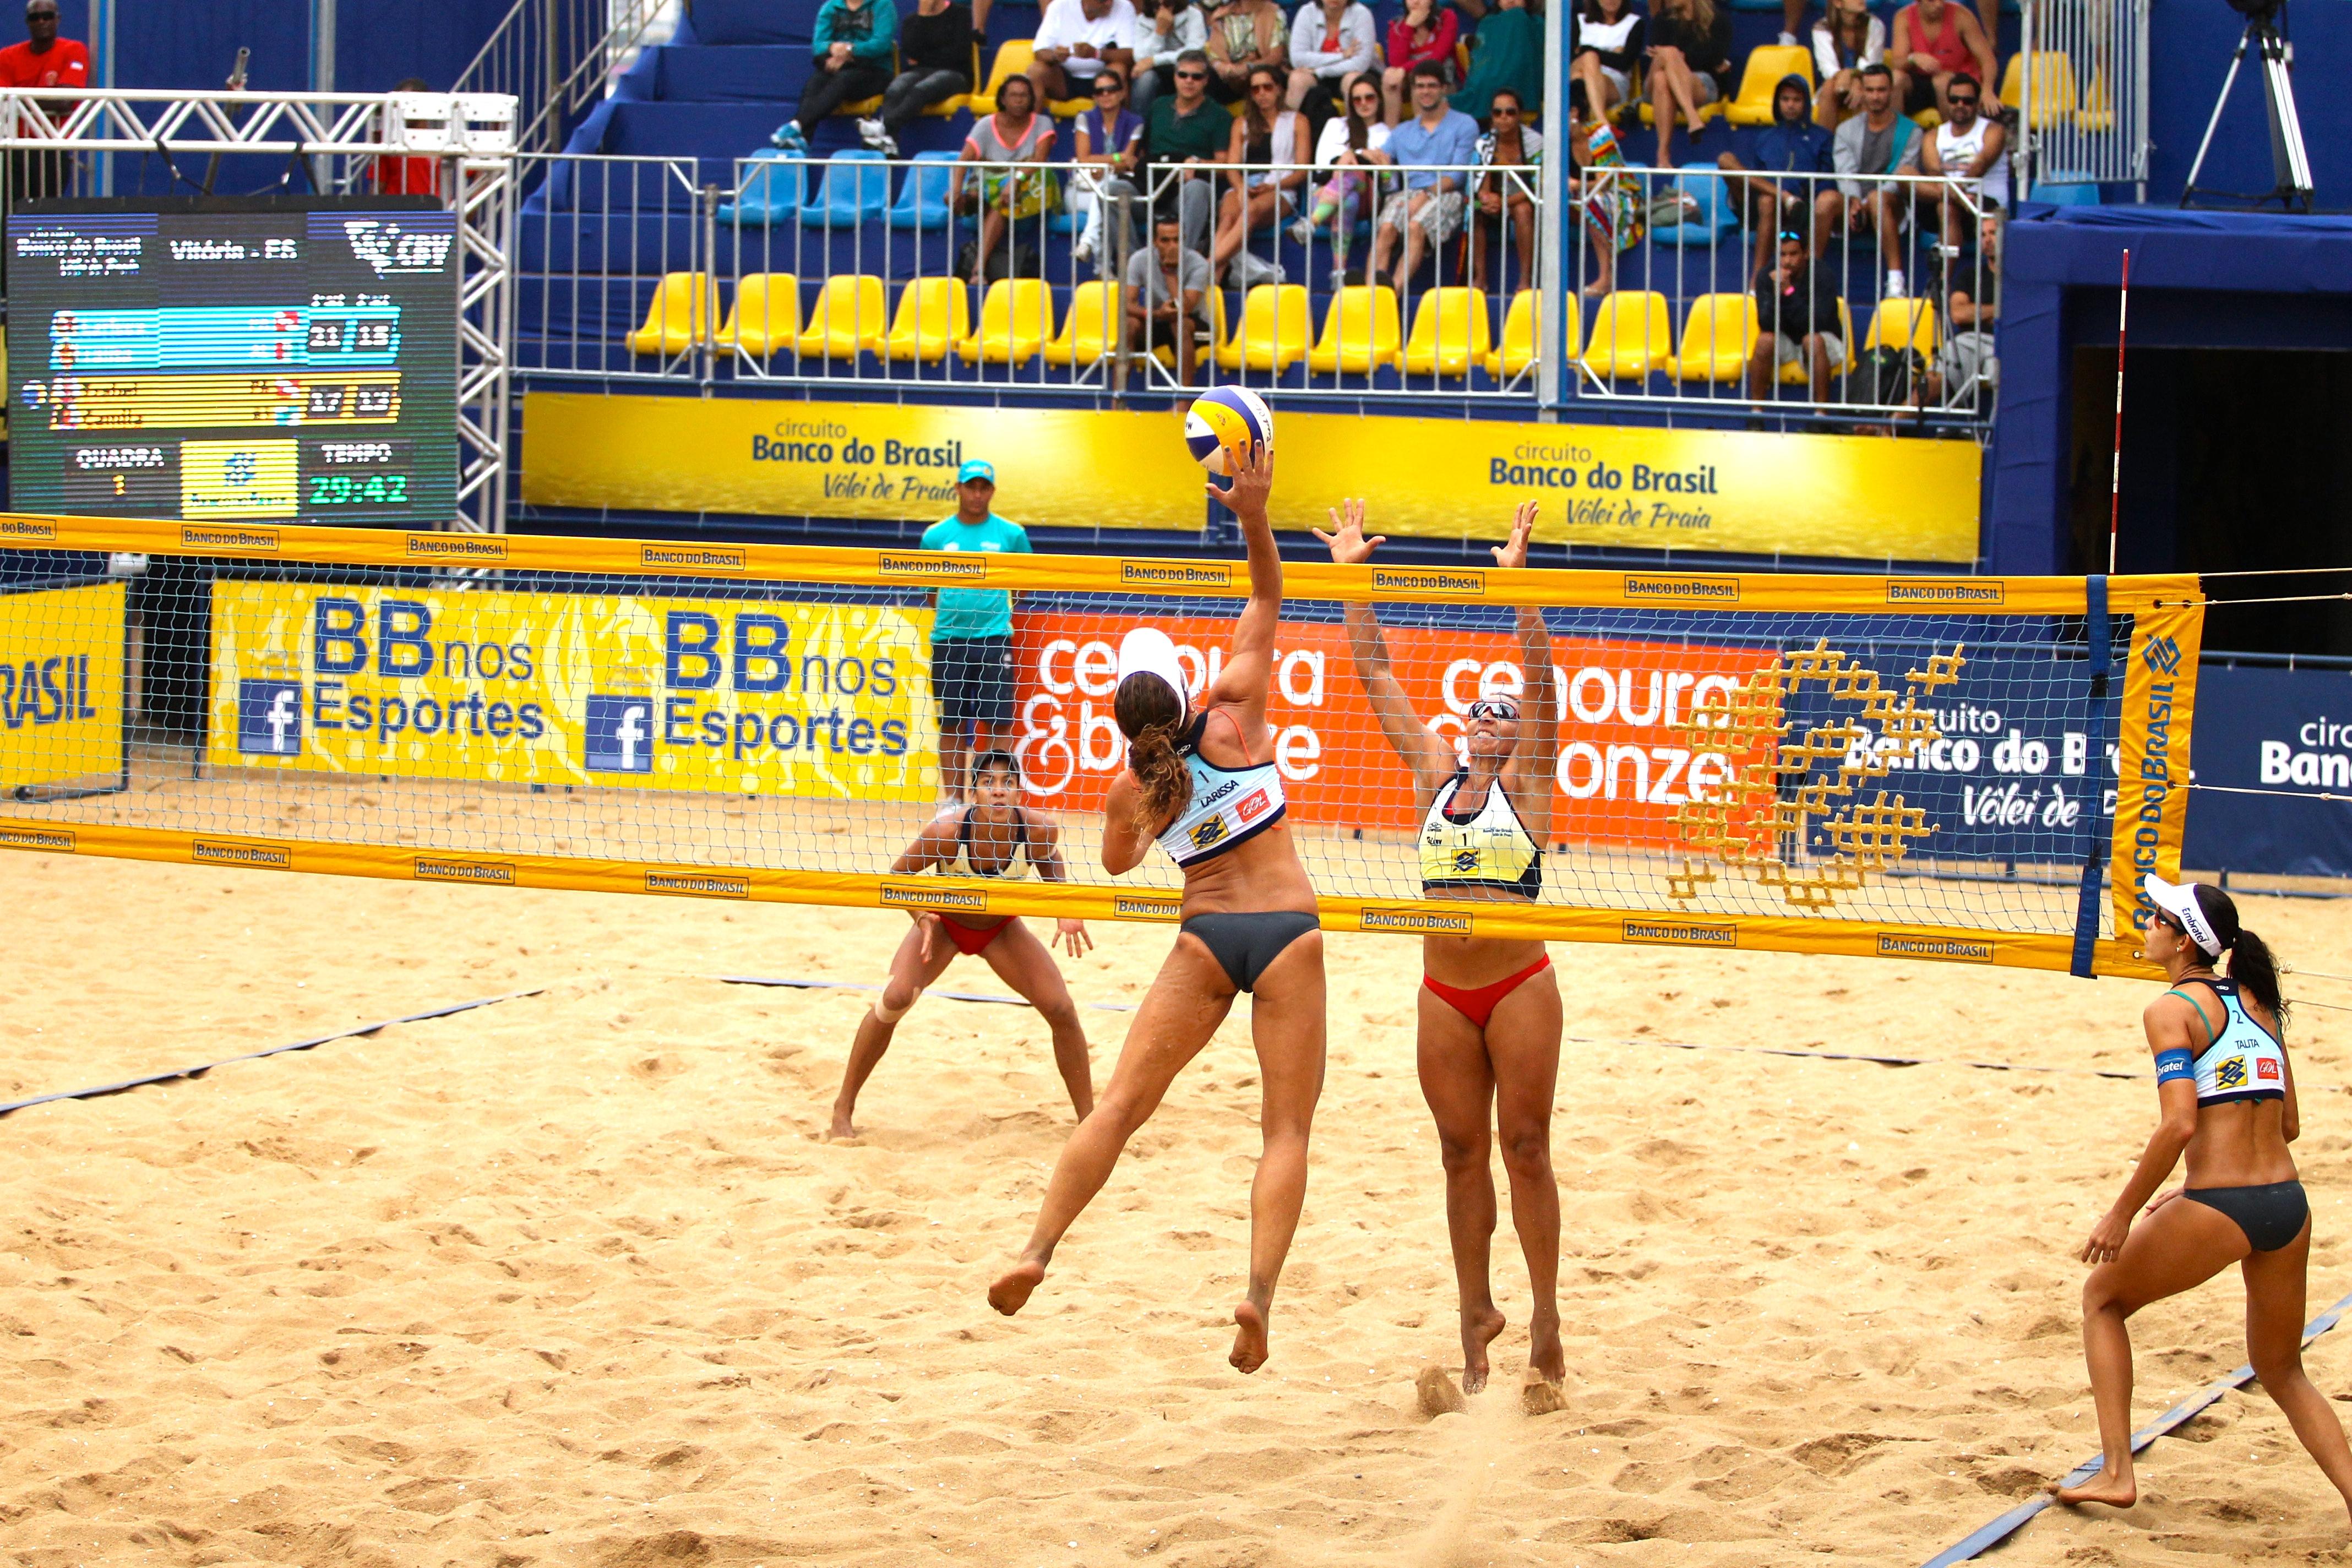 Circuito Banco Do Brasil : Cbv vitória es circuito banco do brasil open